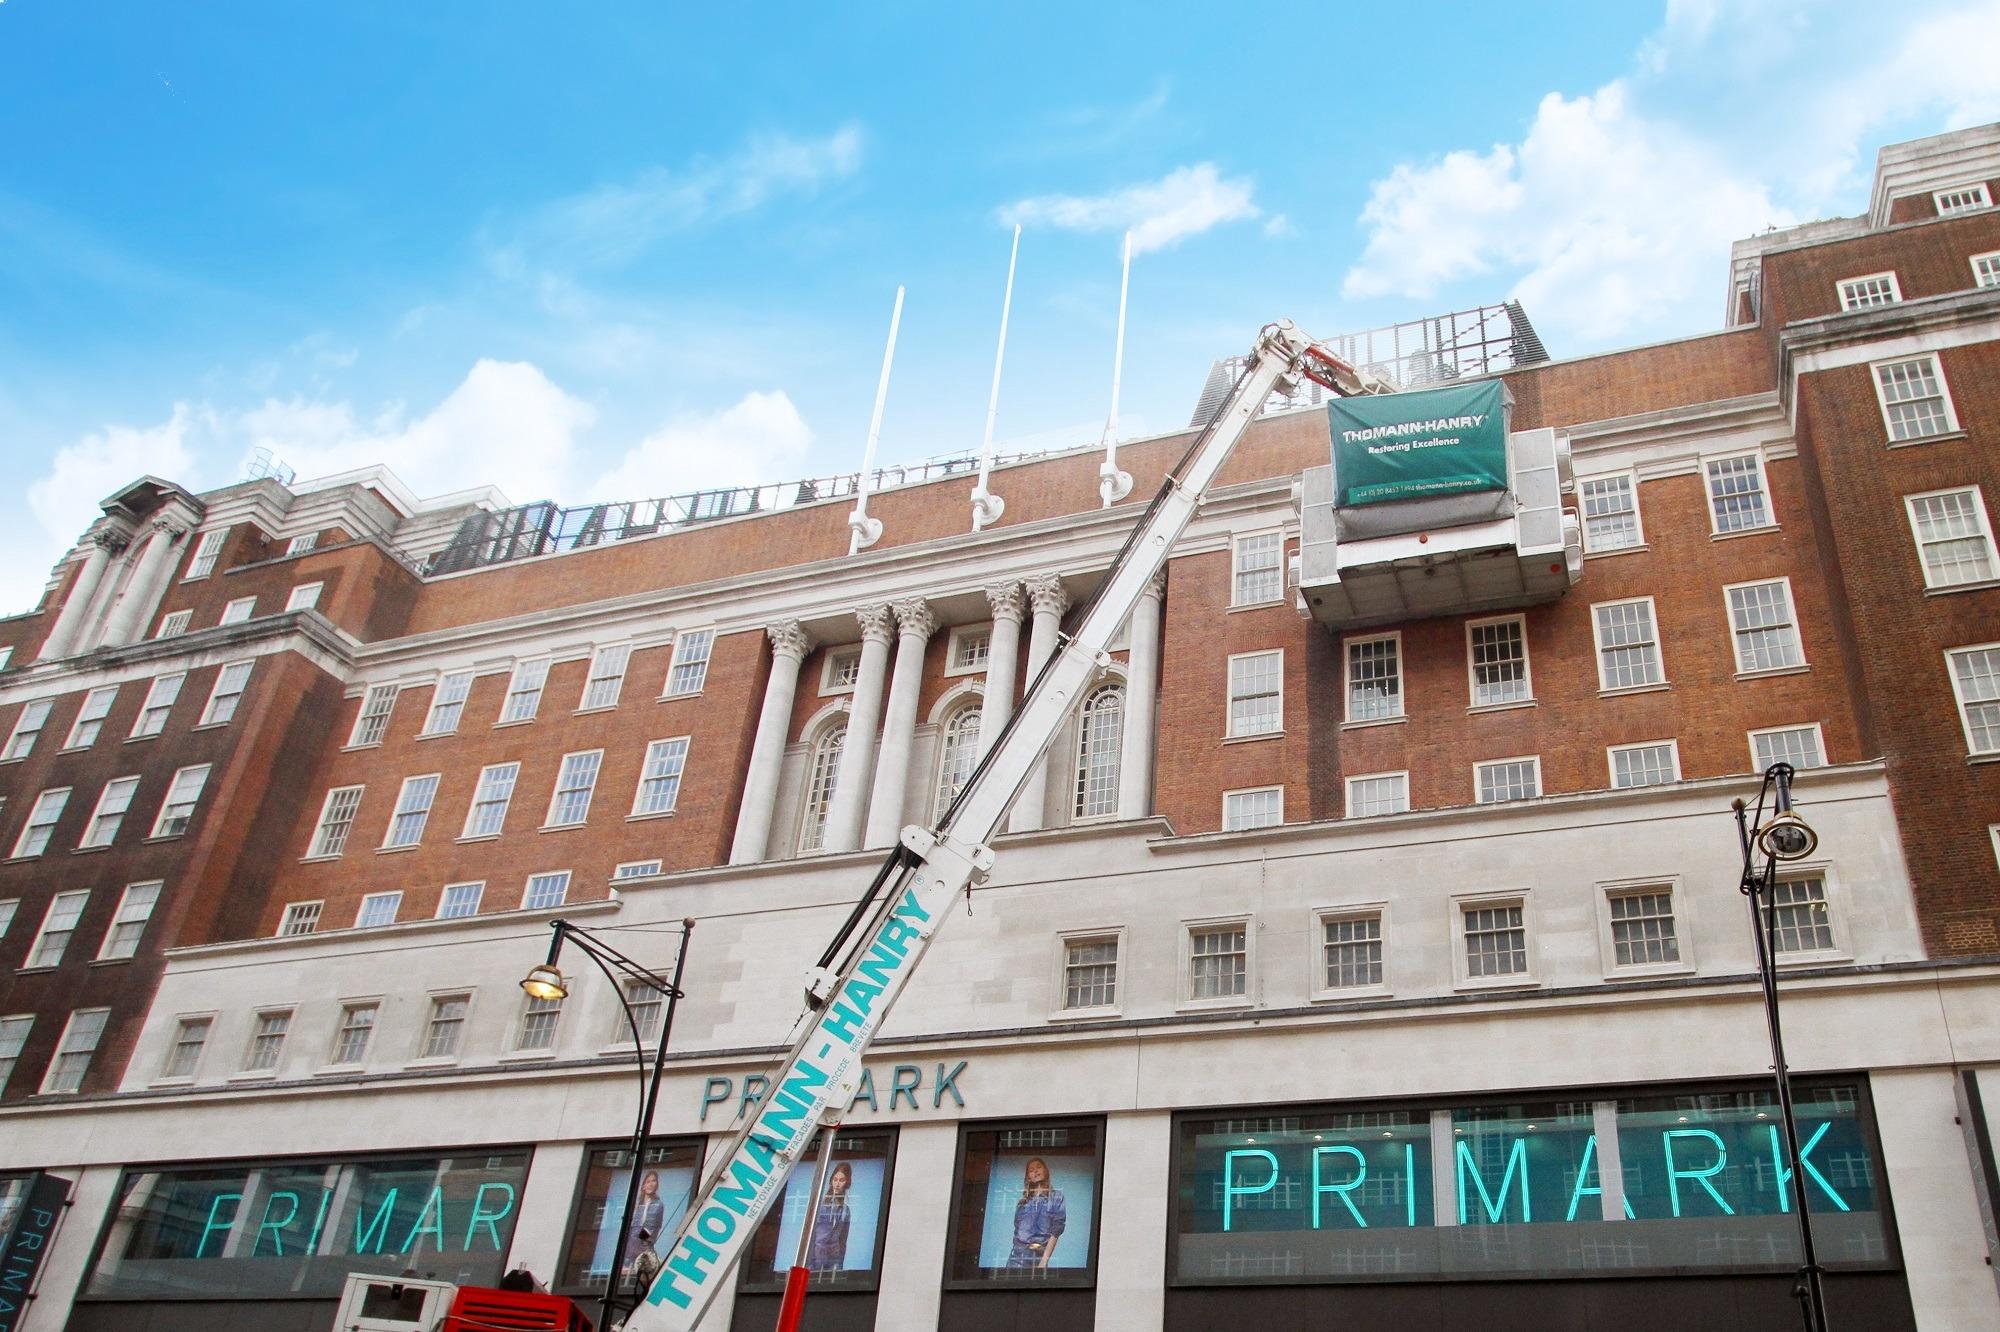 Primark flagship store - Oxford Street